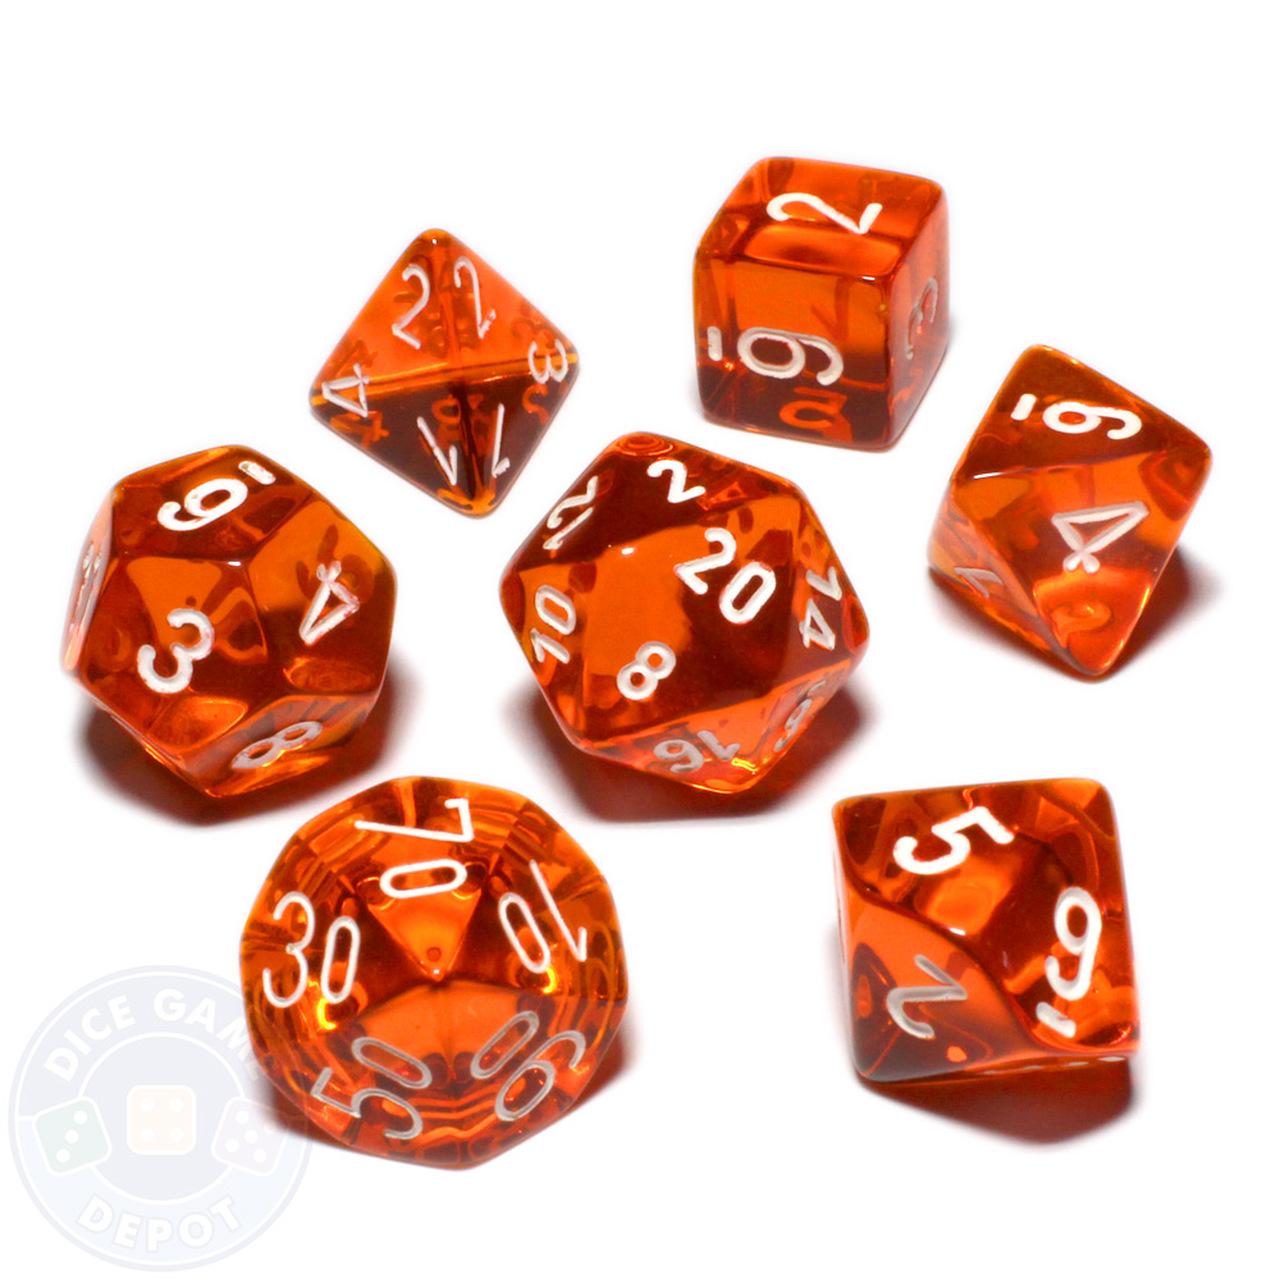 clip royalty free download Transparent dice. Polyhedral set orange .